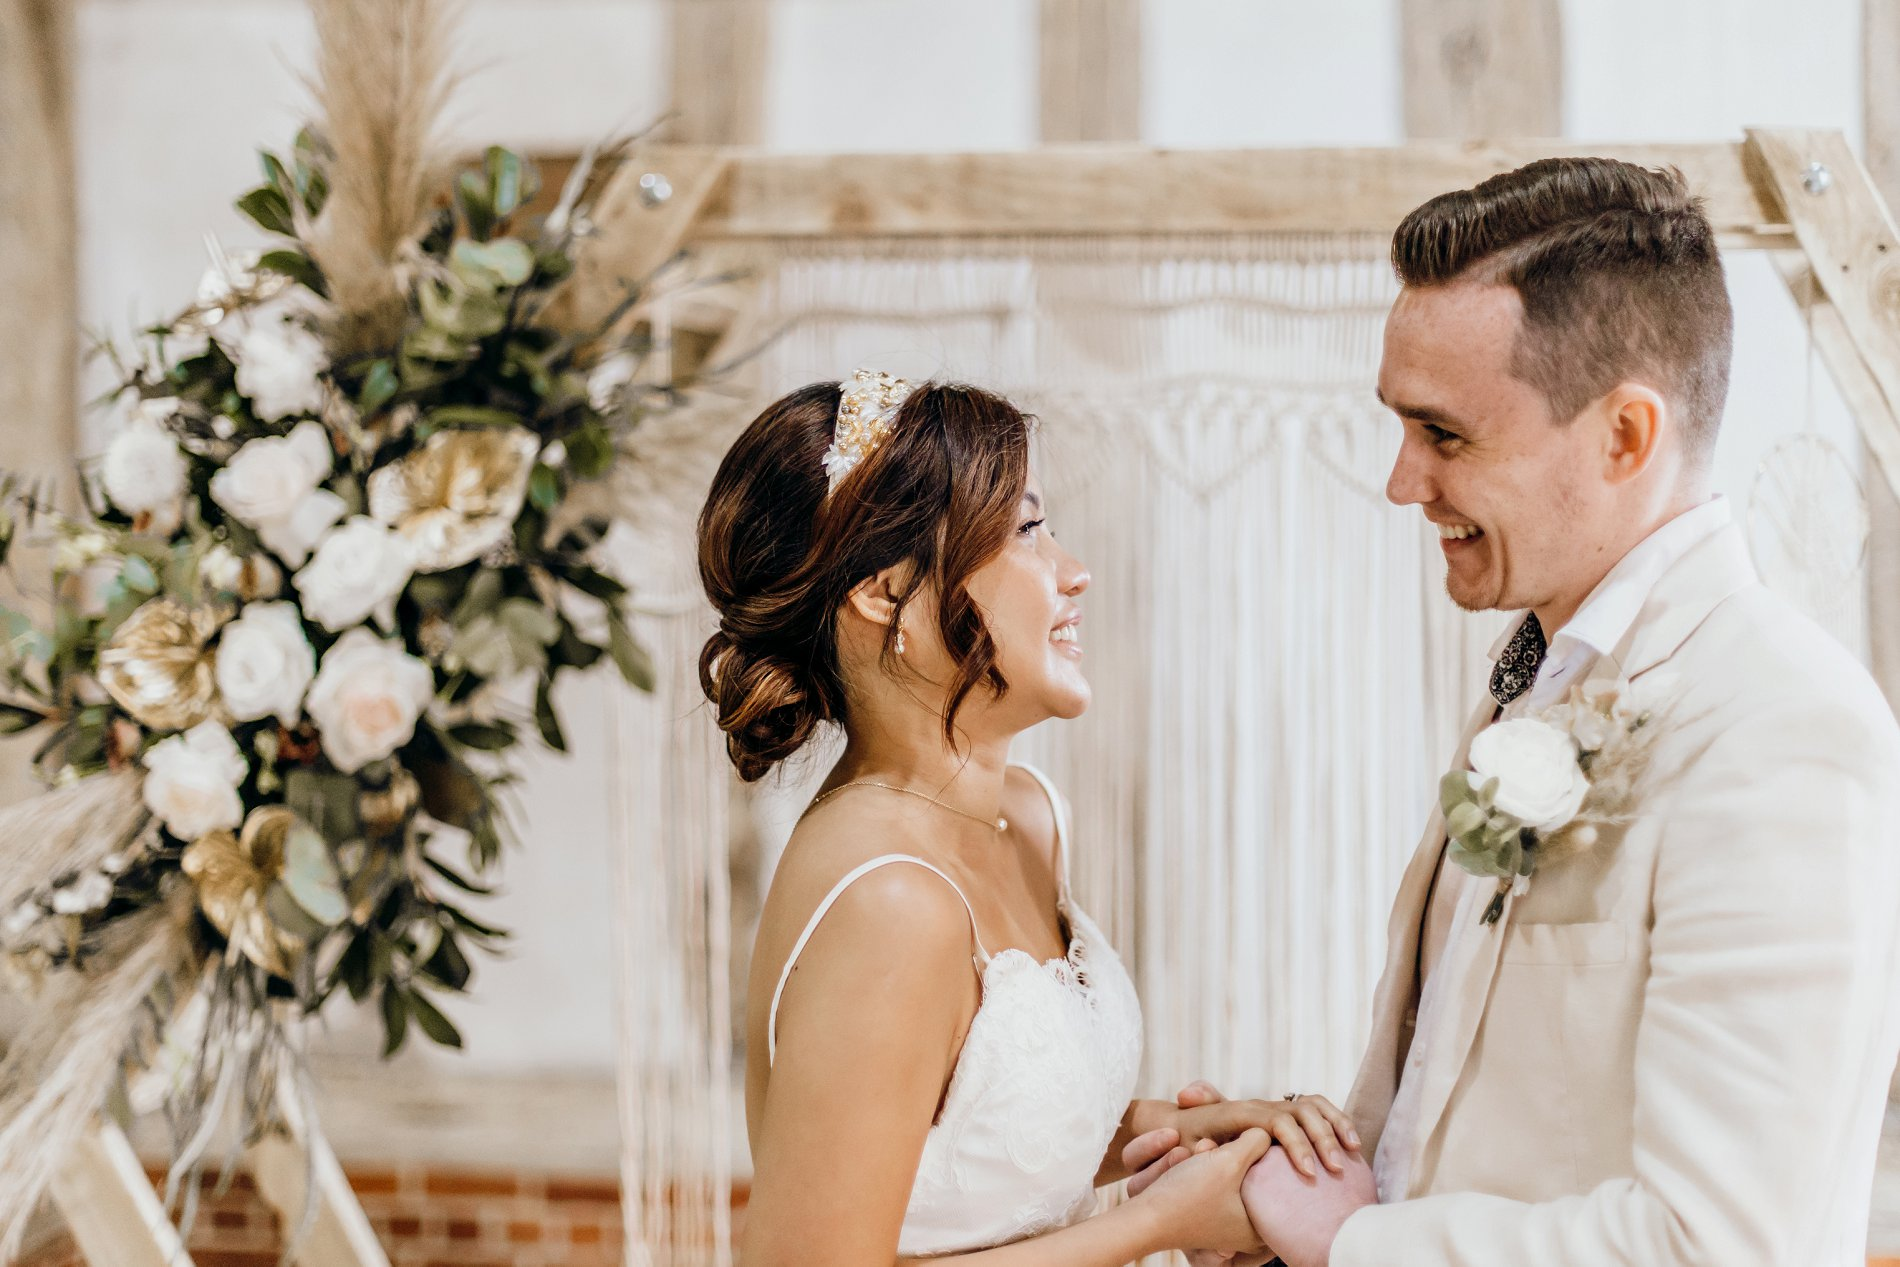 A Golden Boho Wedding Shoot at Cressing Temple Barns (c) Kate Boston Photography (20)